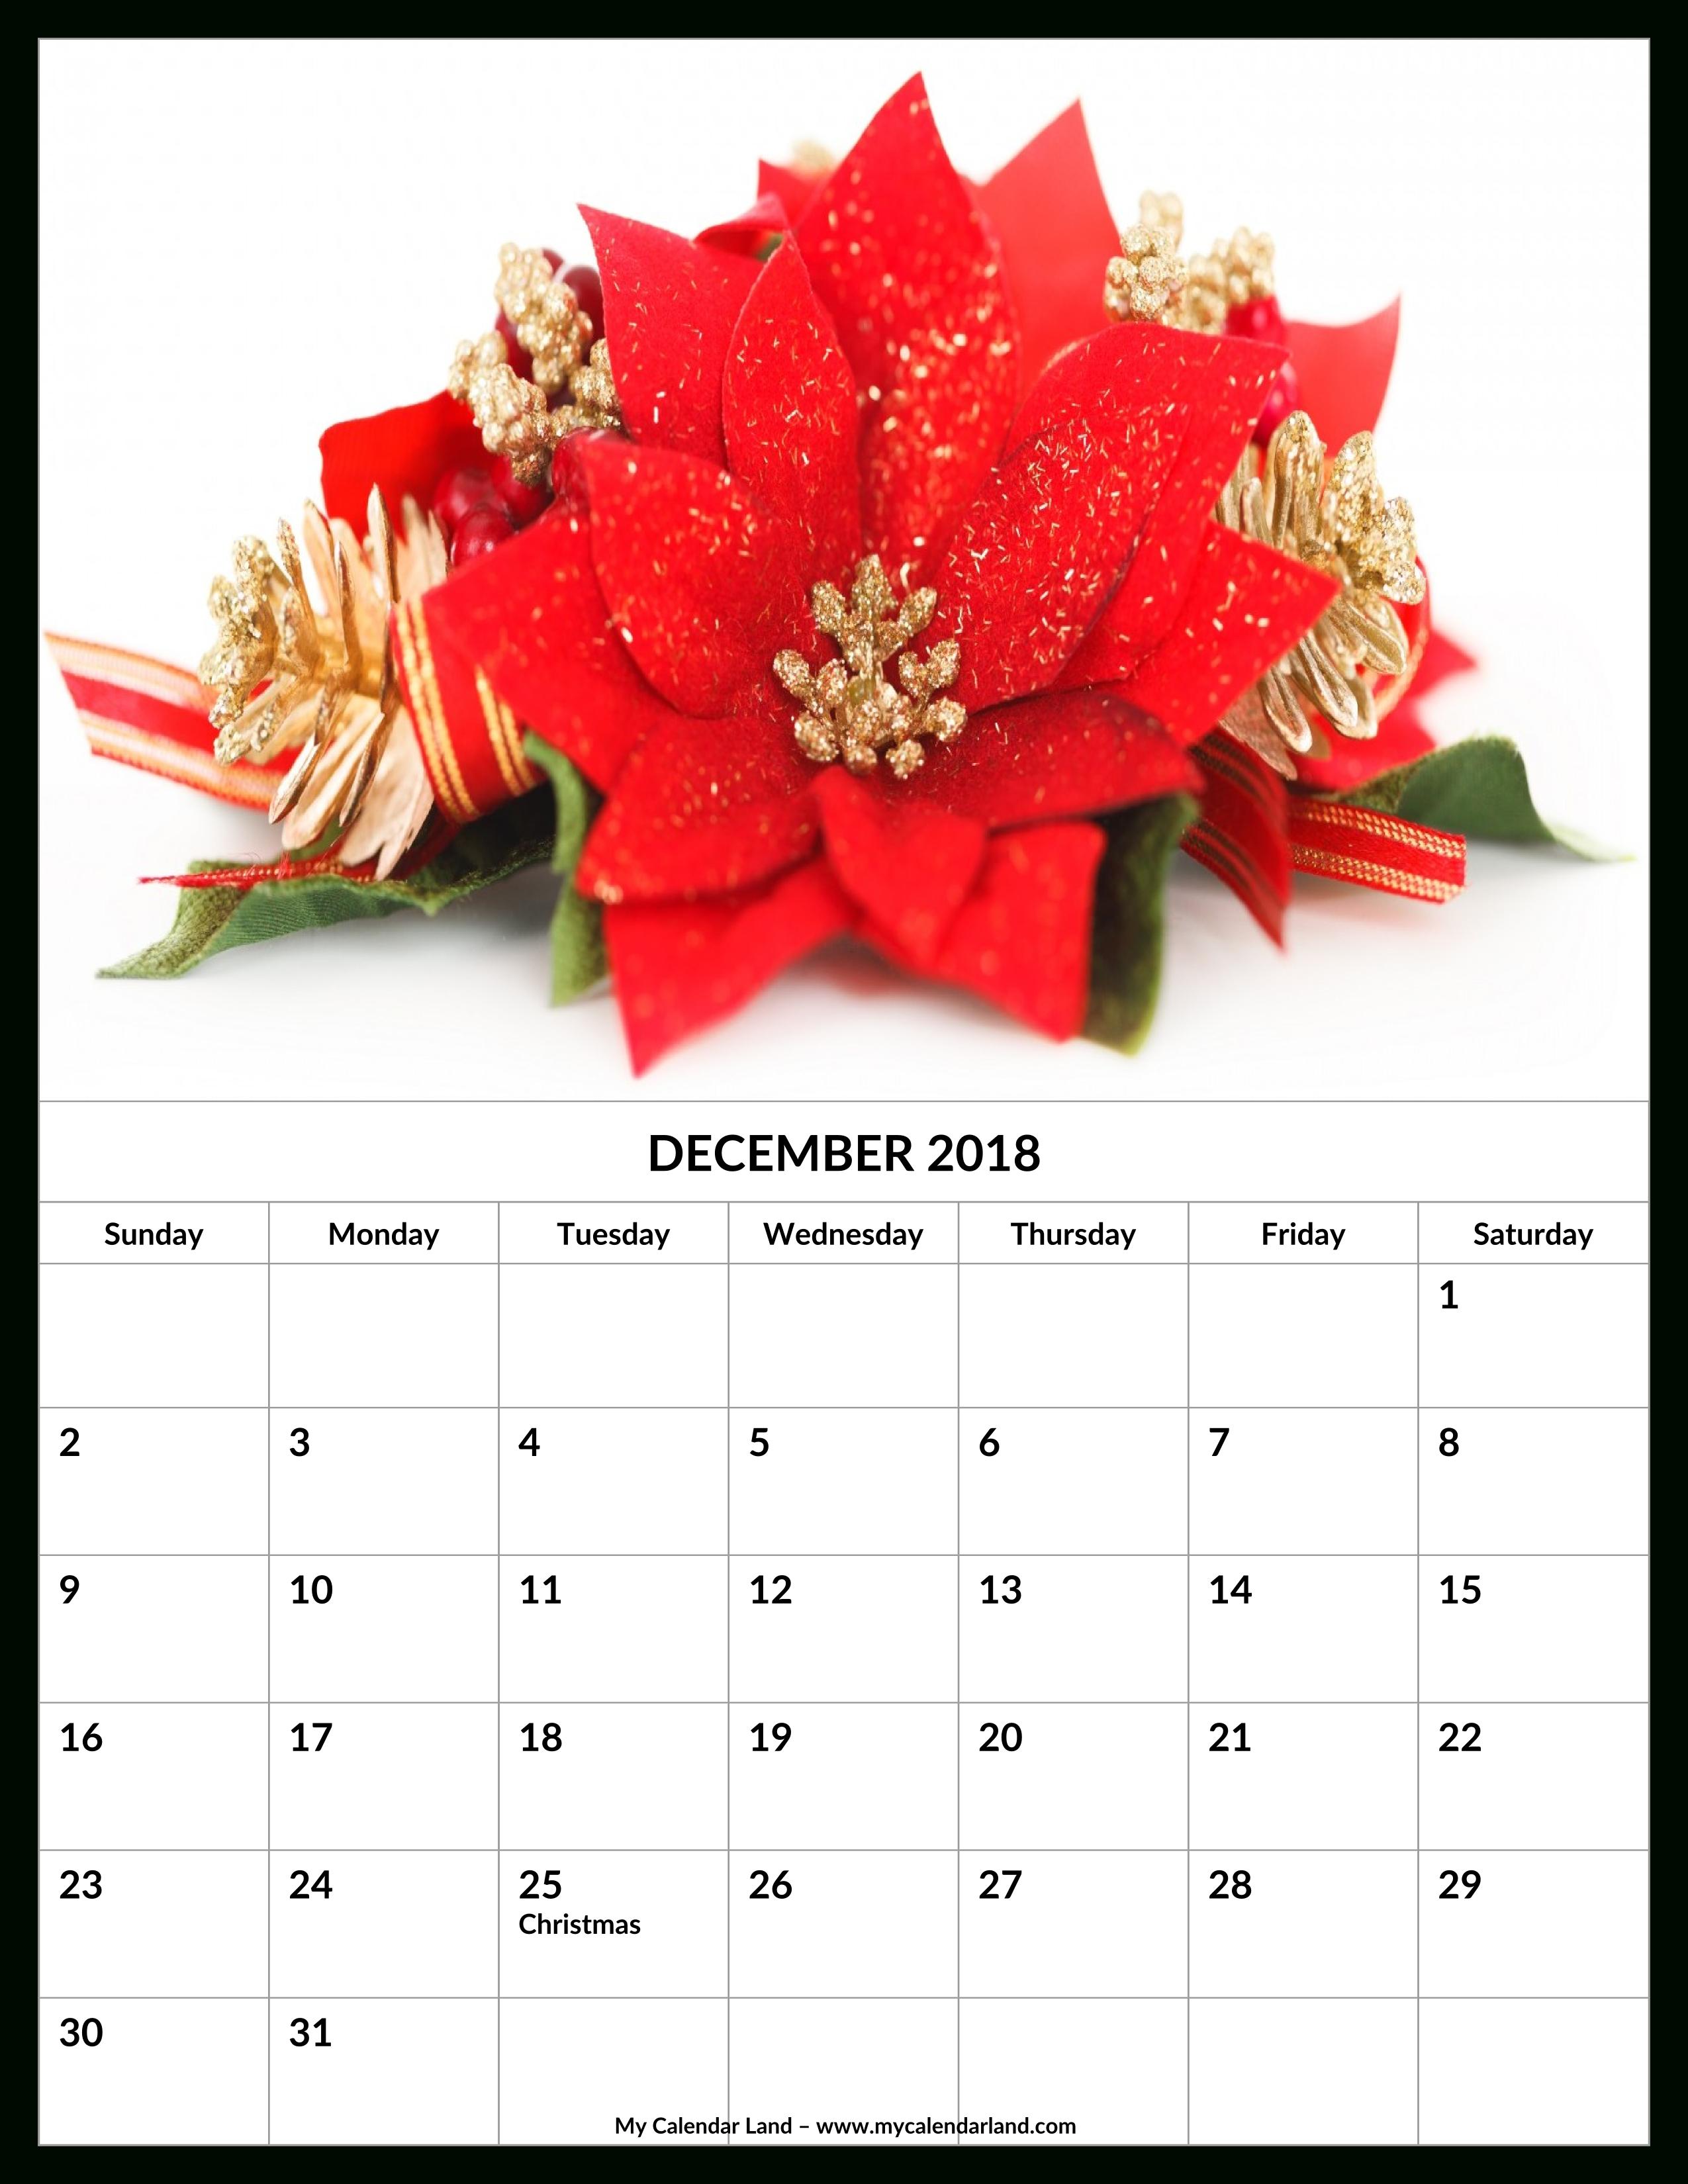 December 2018 Calendar - My Calendar Land regarding Christmas Themed Calendar Templates